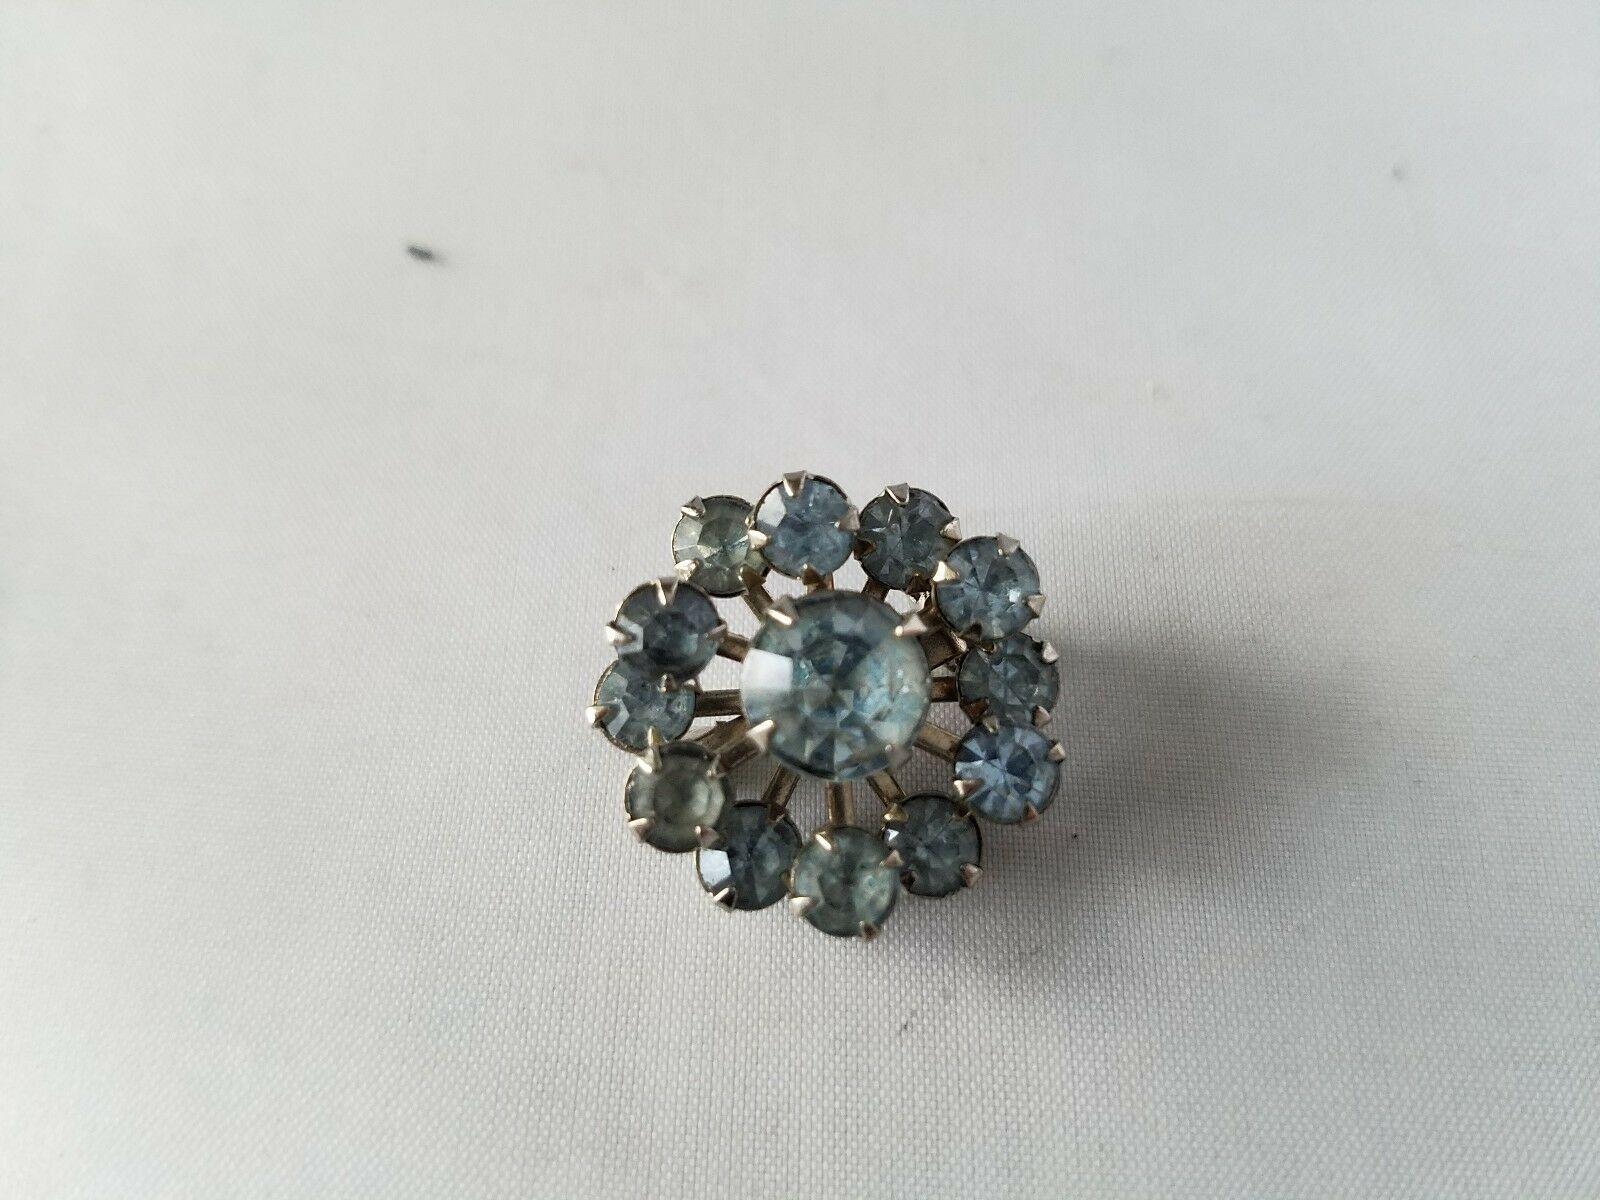 Vintage Fashion Jewelry Set Small Pin Brooch & Matching Earrings Rhinestone